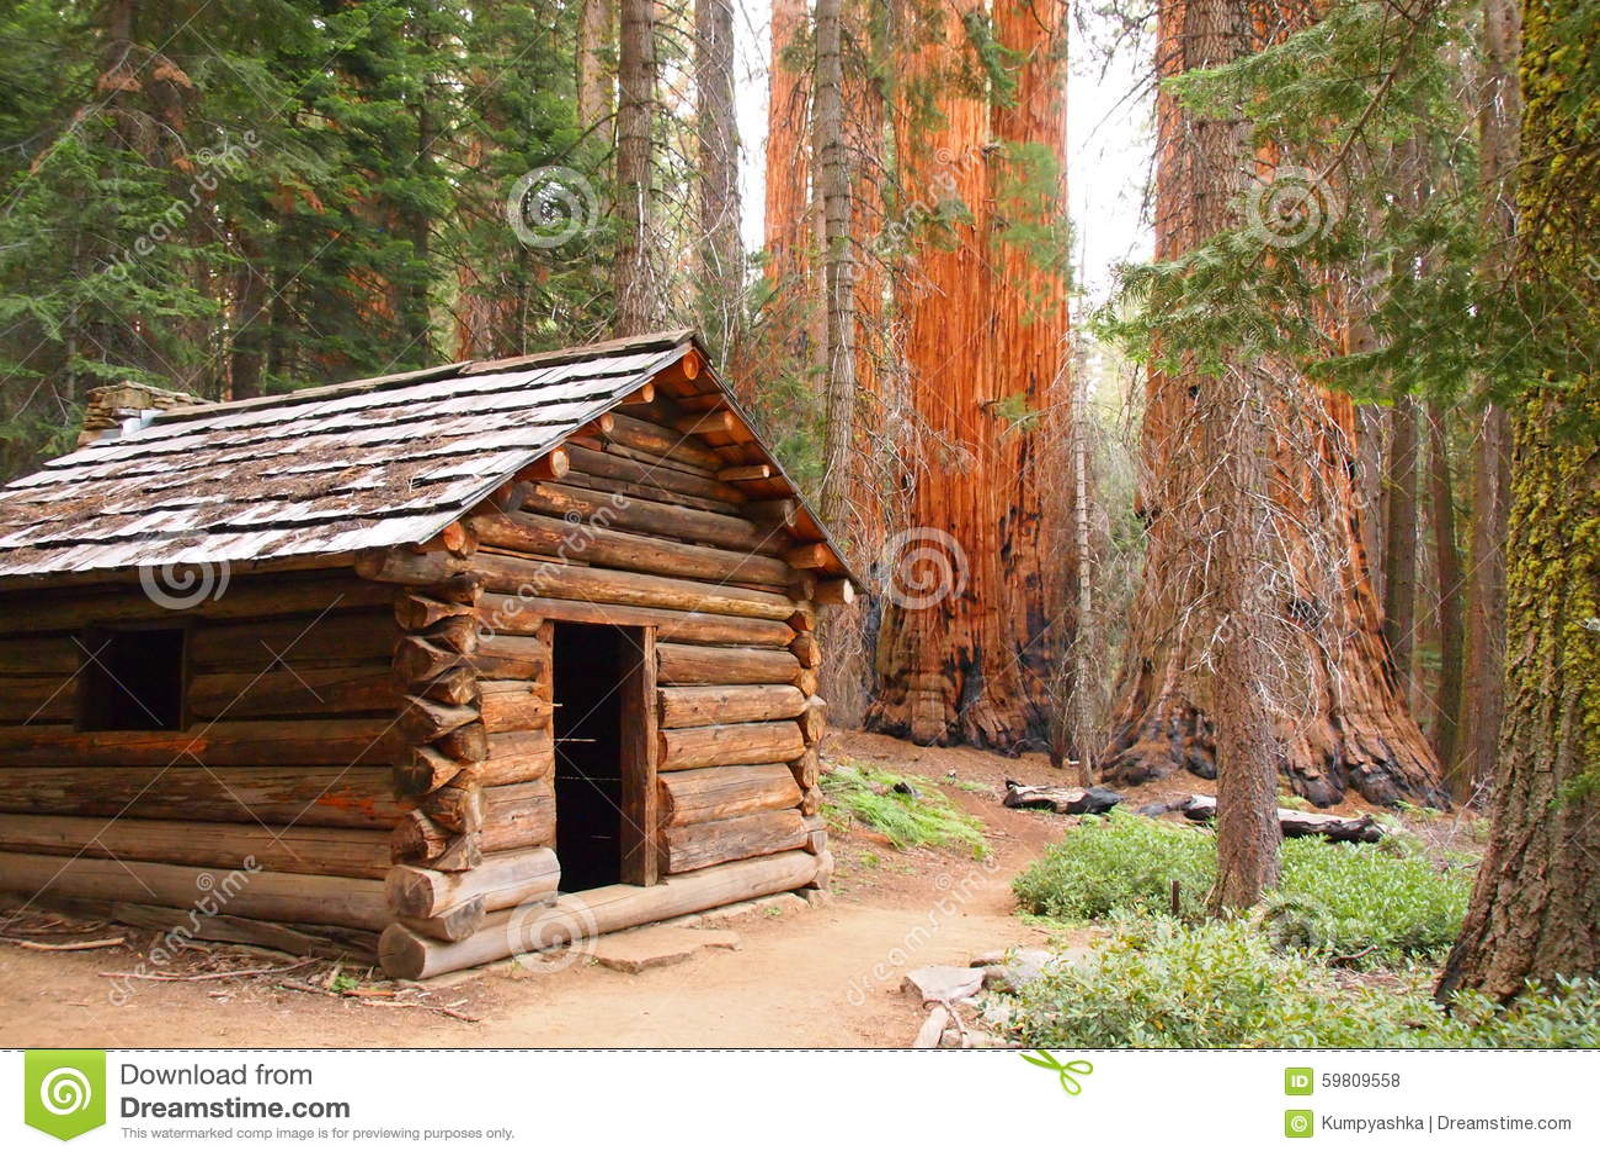 cabins travel ca sequoia magazine manzanita national park getaways for volcanic in lassen lake best camping sunset